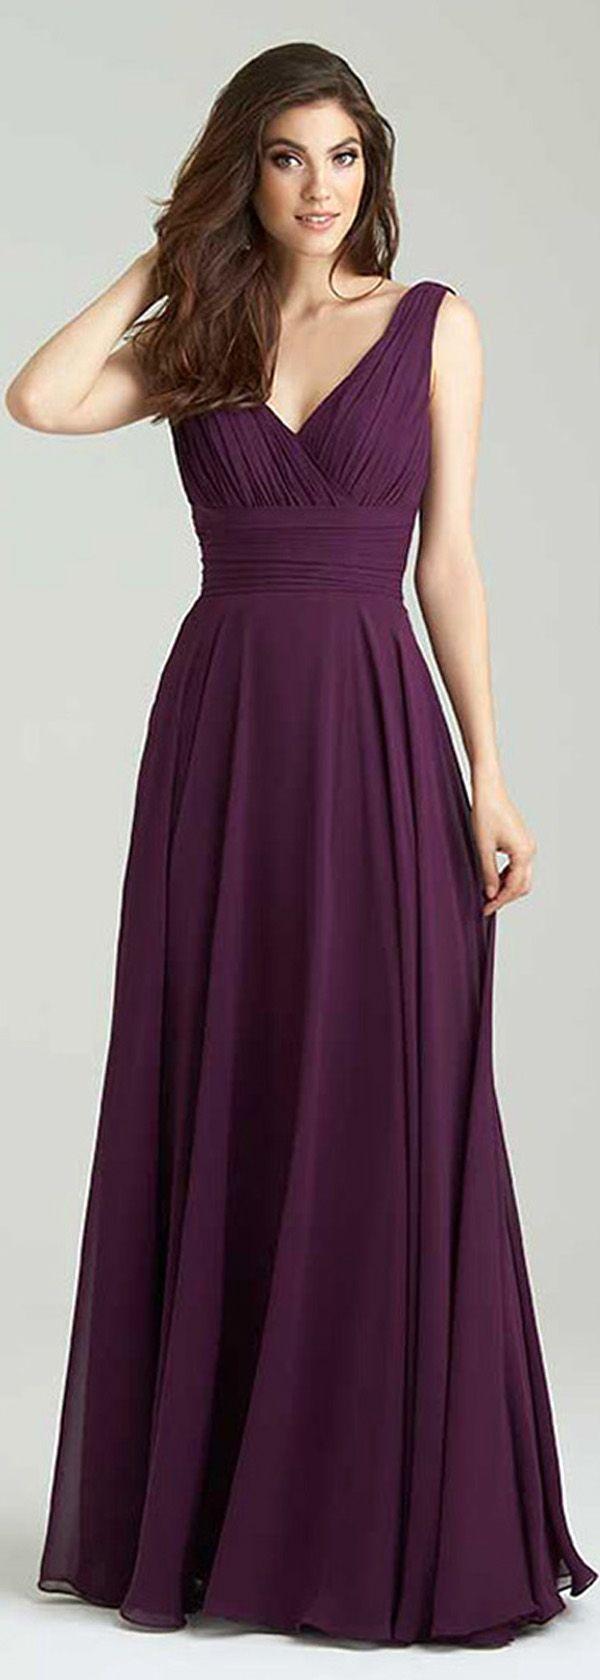 Gorgeous Chiffon V-Neck Neckline A-Line Bridesmaid Dresses With Pleats